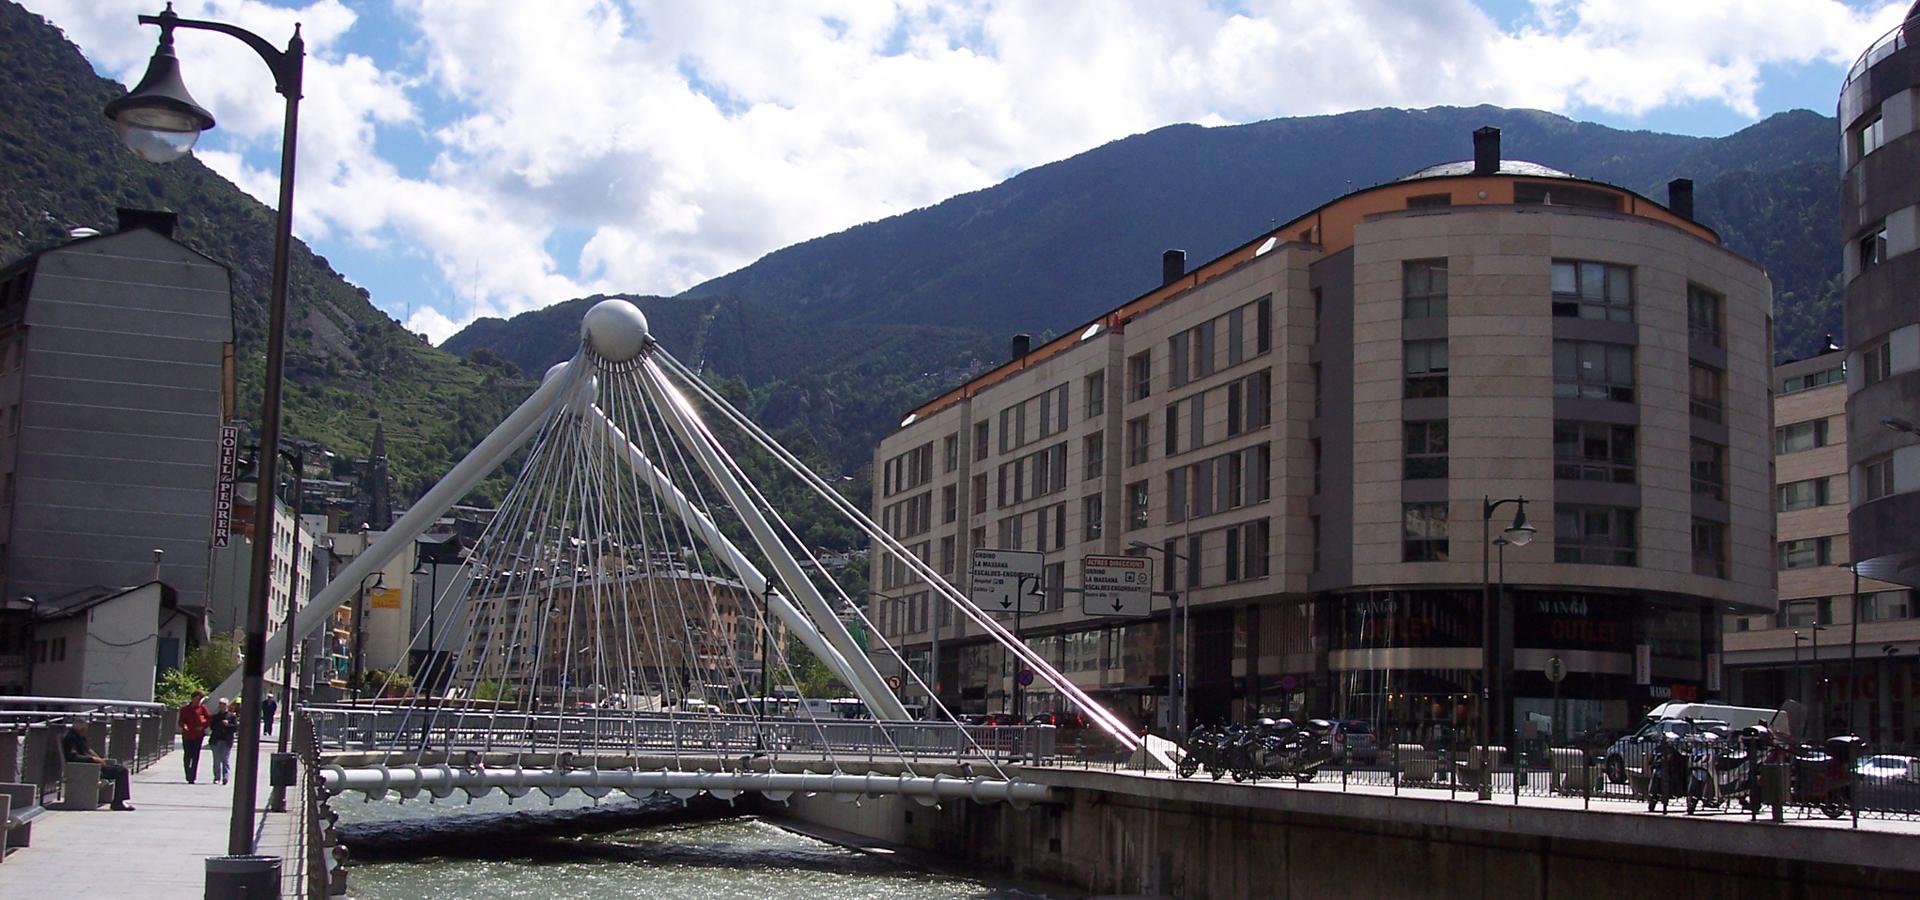 <b>Europe/Andorra/Andorra_la_Vella</b>